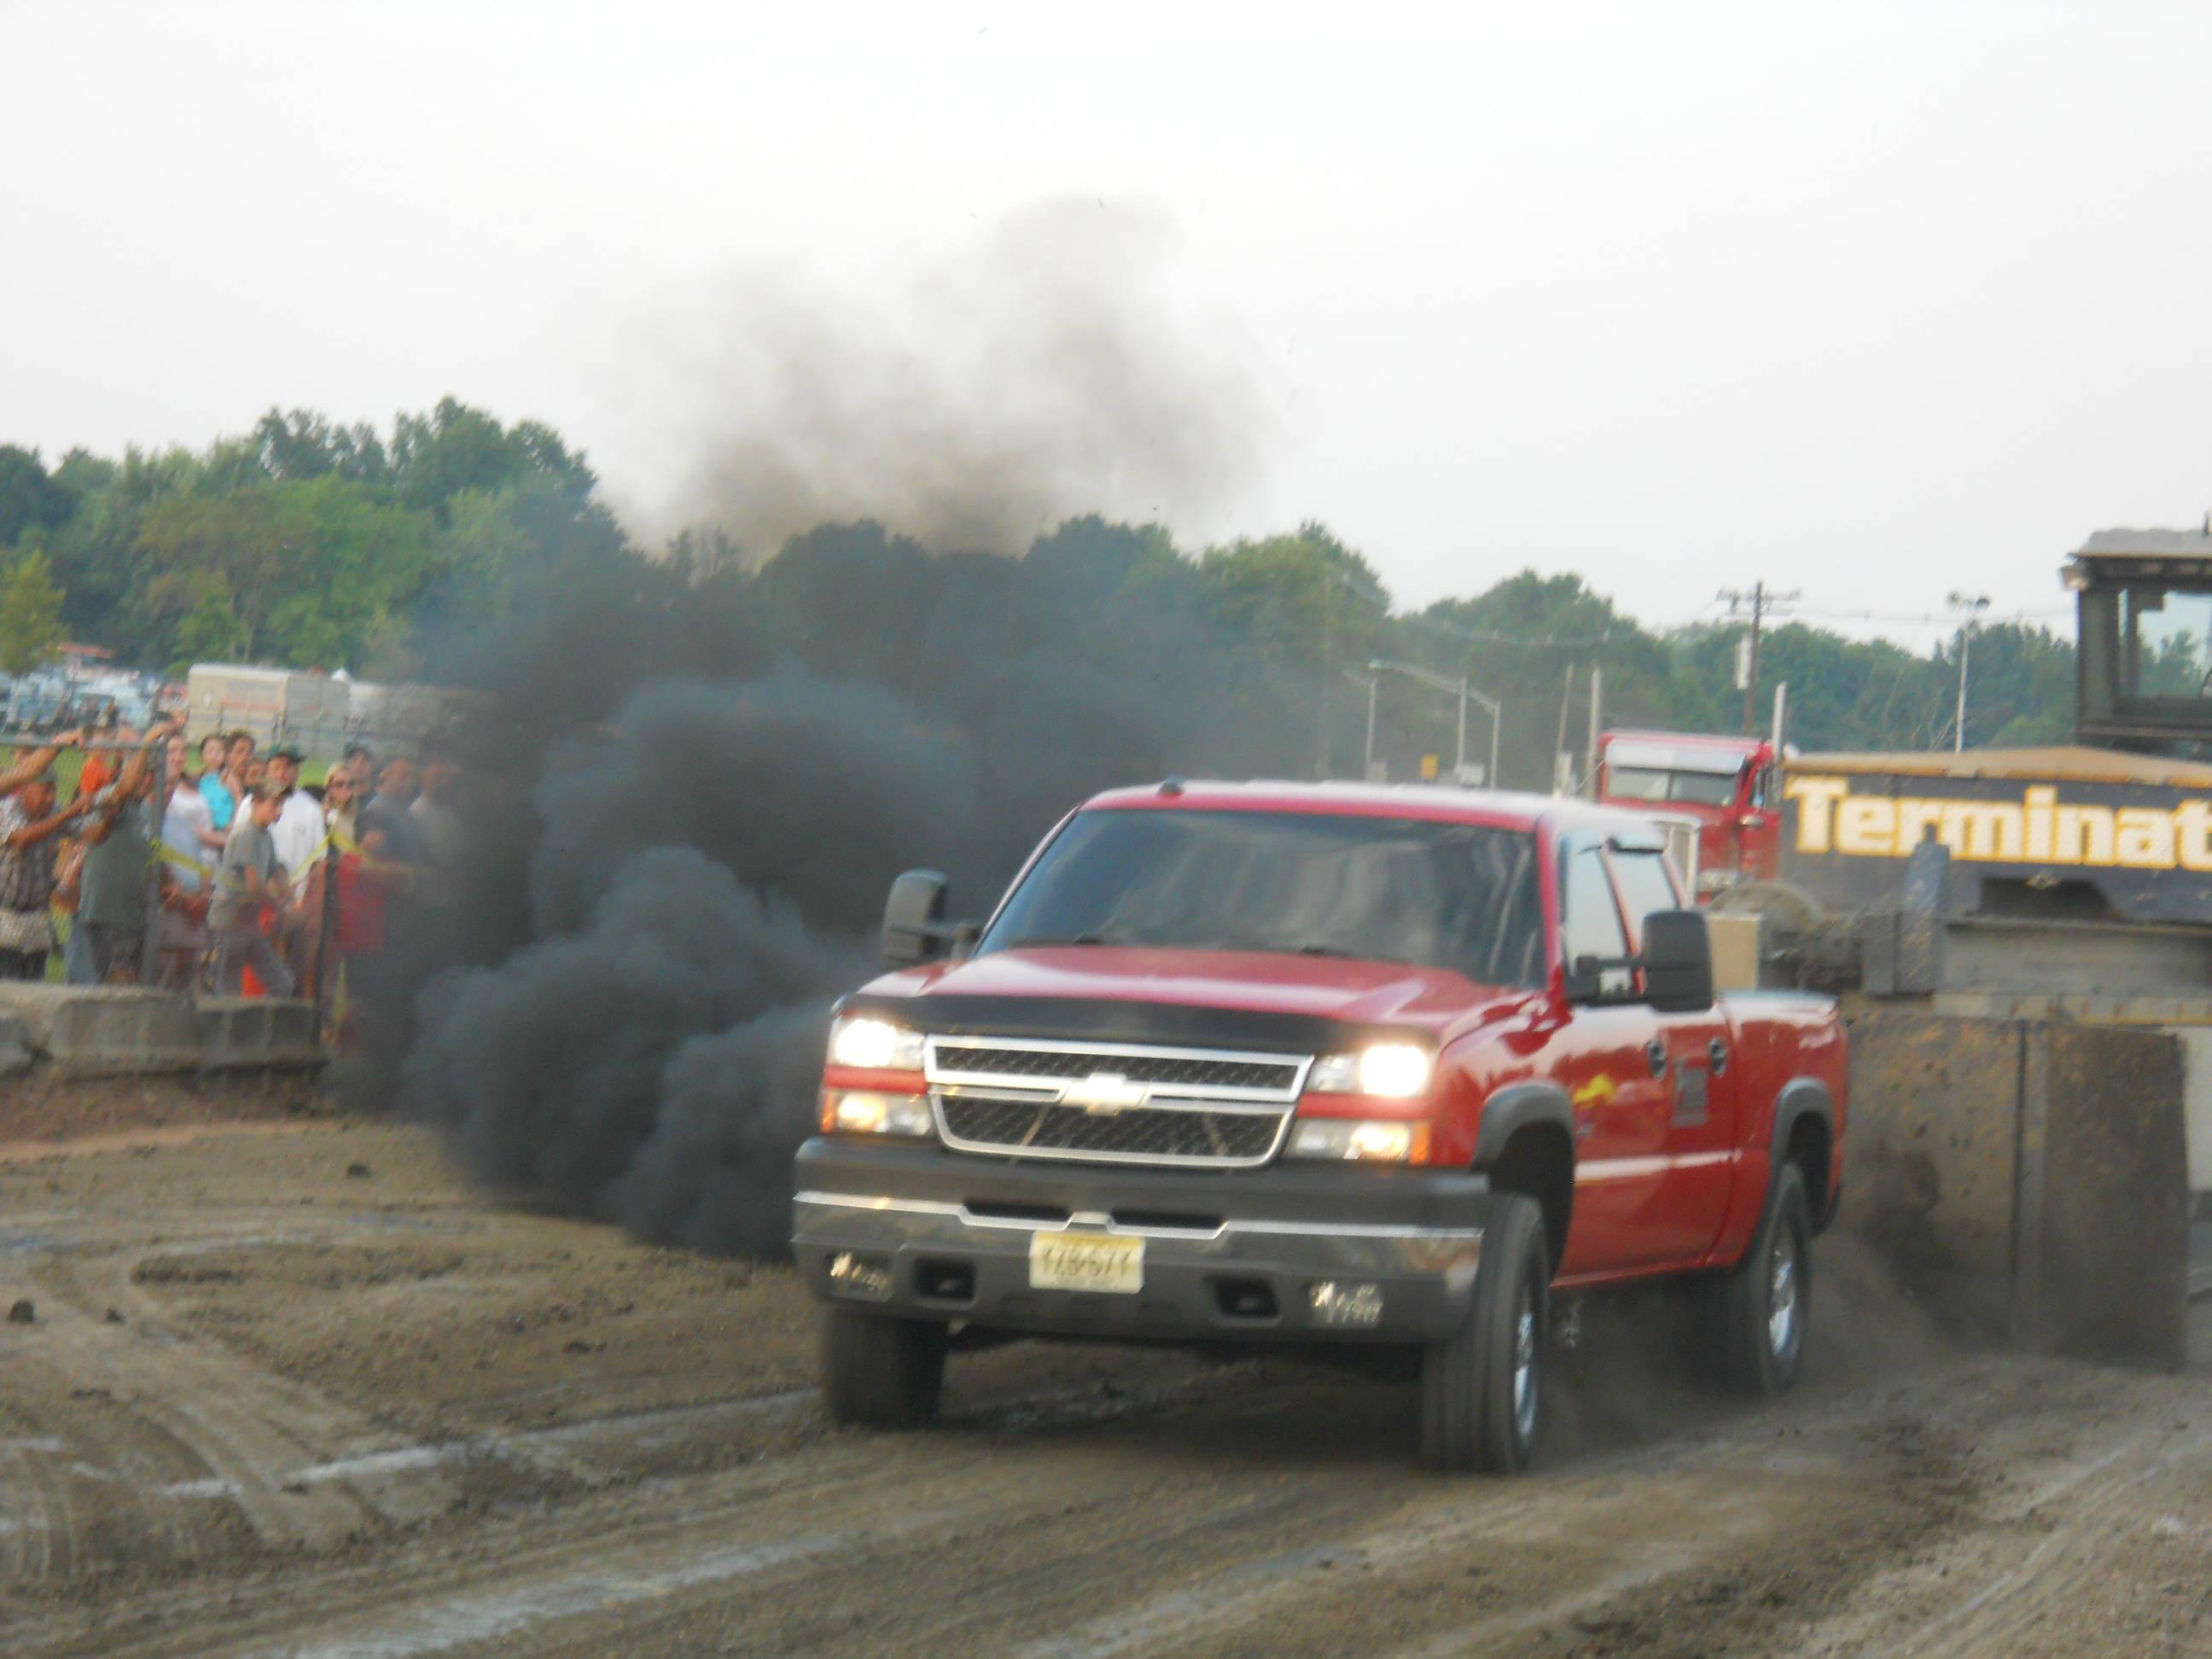 f68b267424f93be40e69_red_pickup_smoke_Fair_2013.jpg